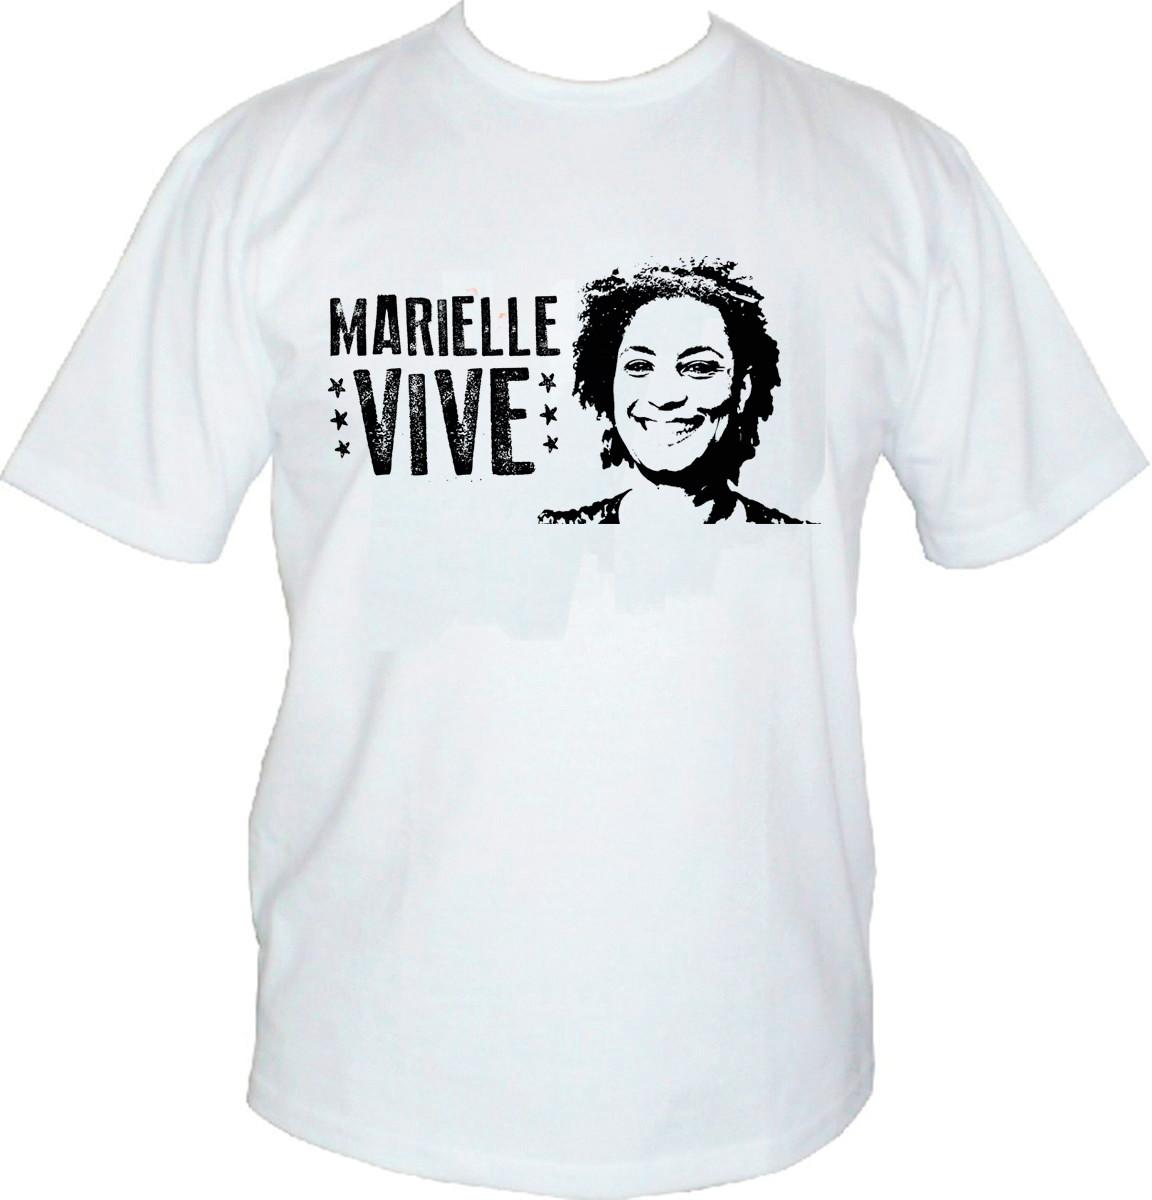 Camisas Marielle Vive  267ae7c7d1d8a